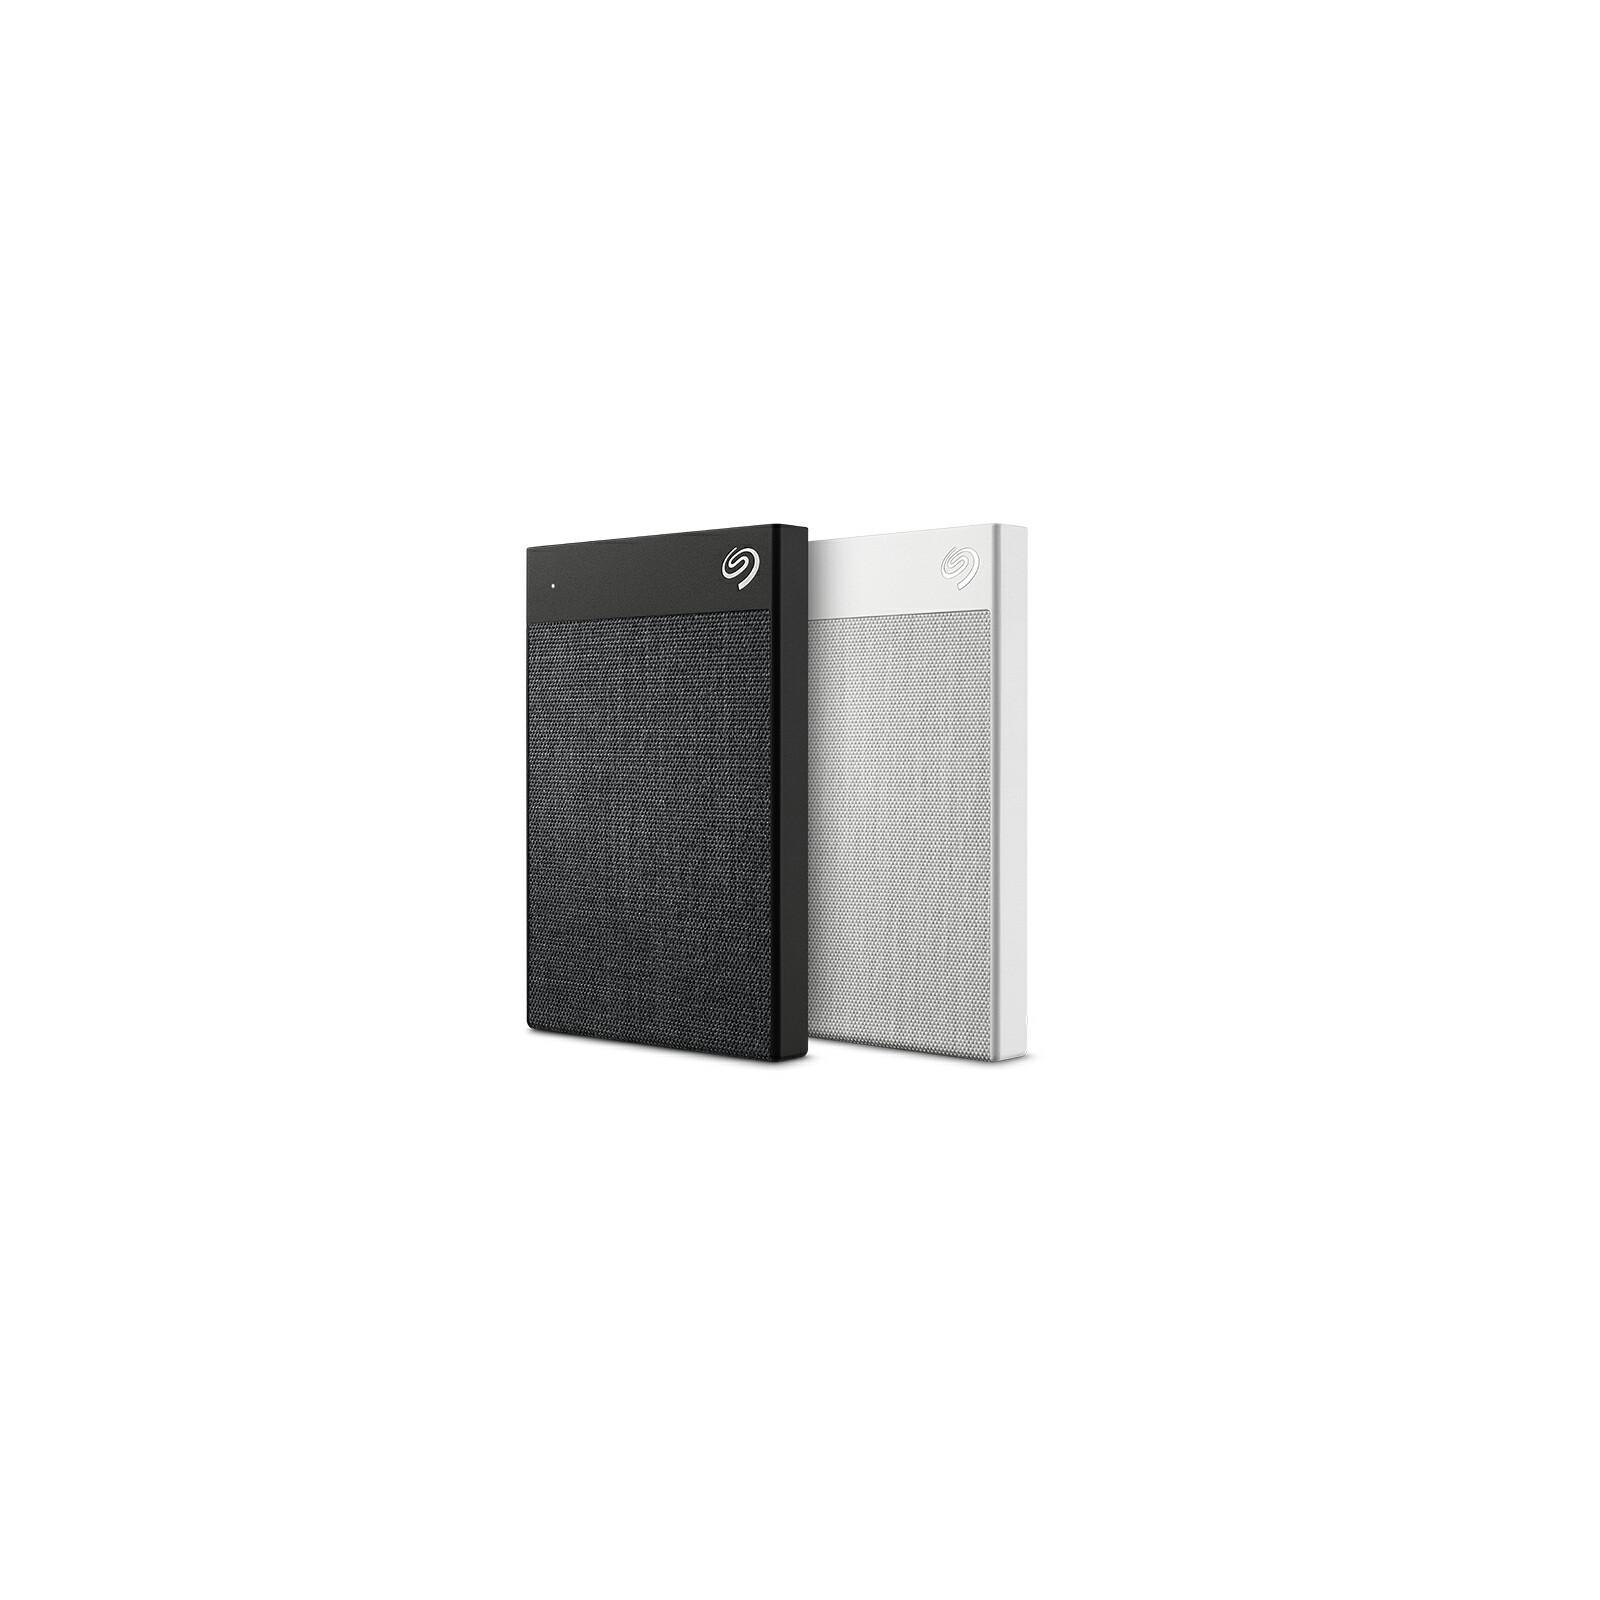 Seagate HDD Backup Ultra 1TB weiß/silber